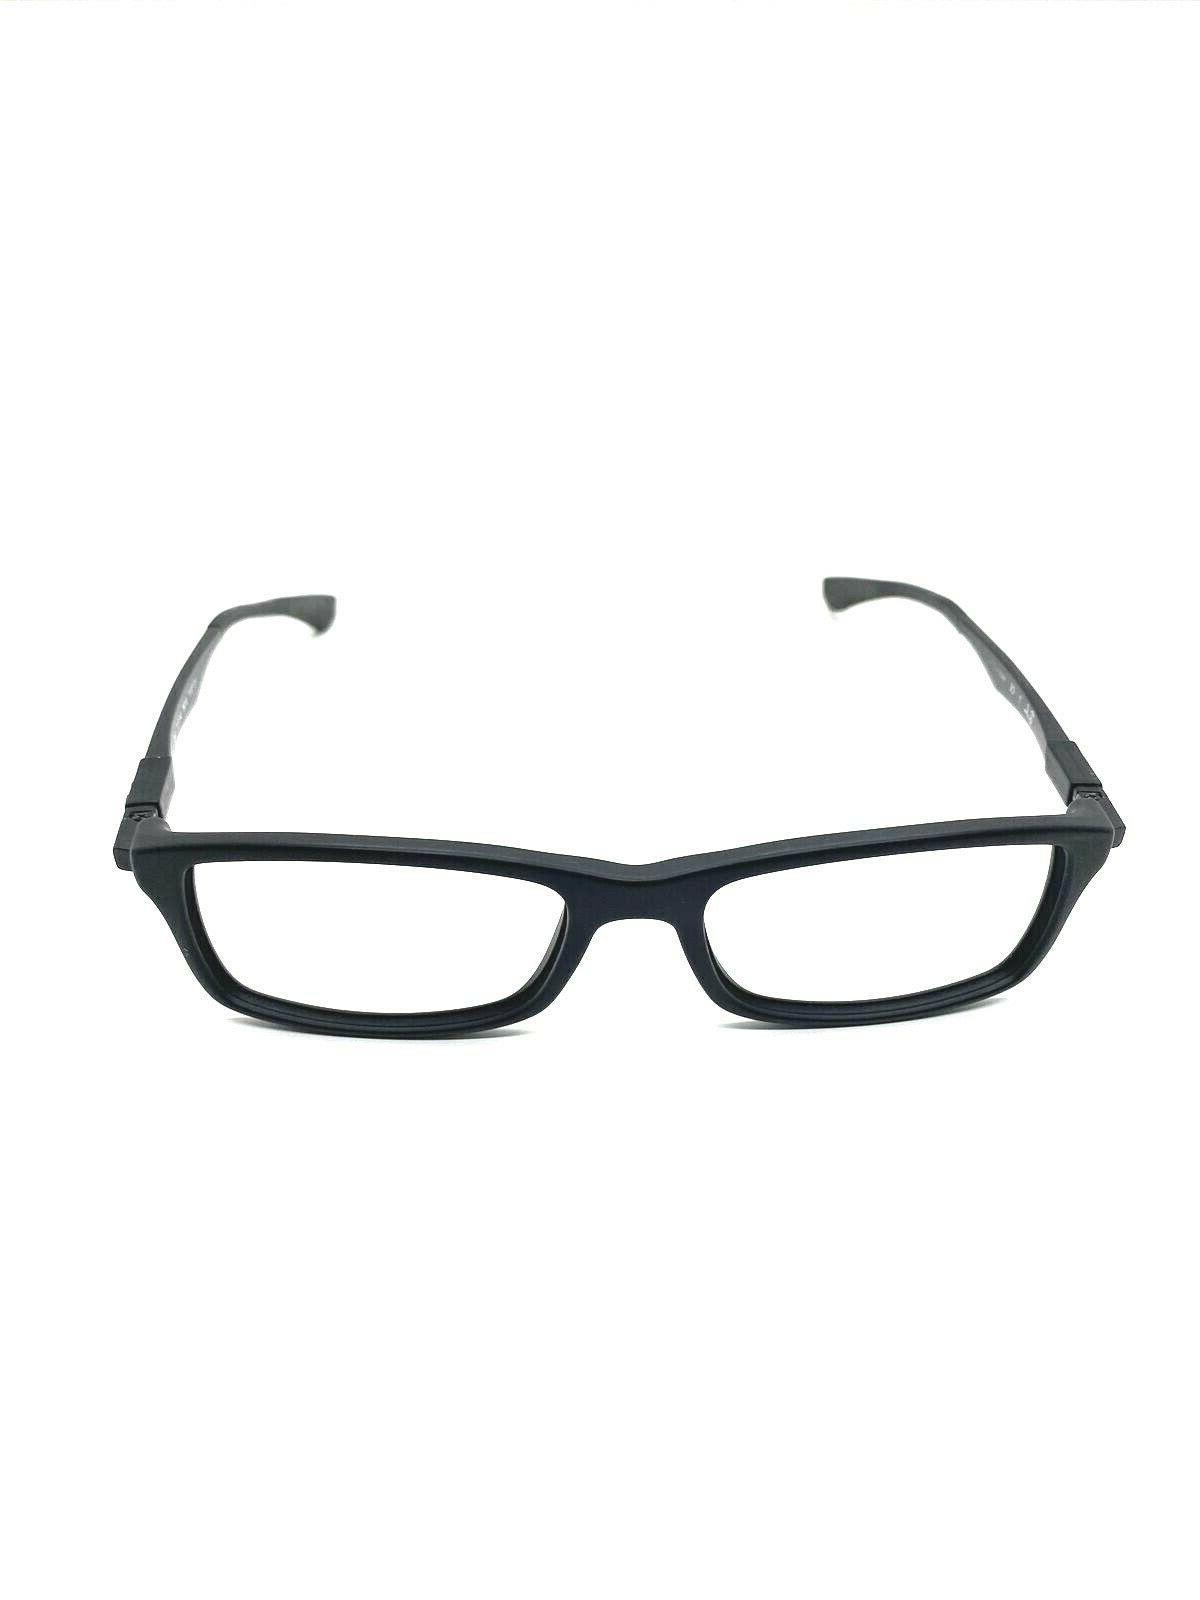 Ray Ban 5196 5417 145 Eyeglasses/Frames L10